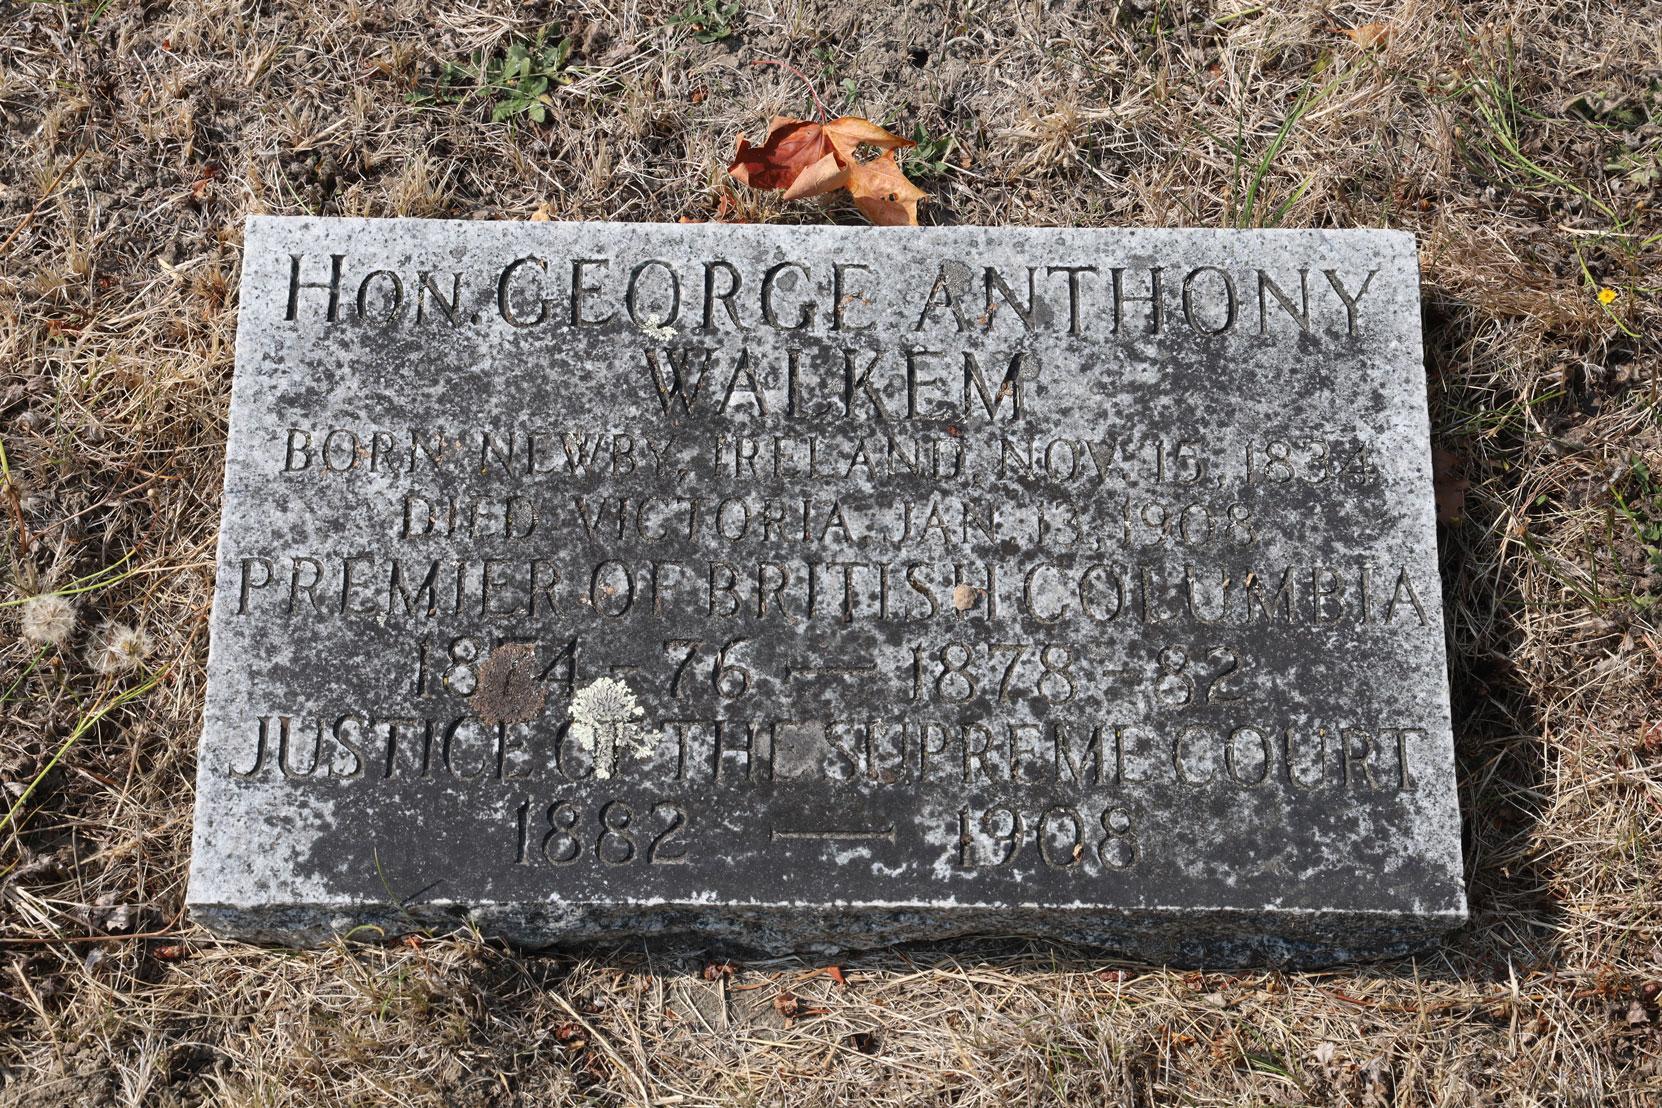 George Anthony Walkem gravestone, Ross Bay Cemetery, Victoria, BC (photo: Temple Lodge No. 33 Historian)